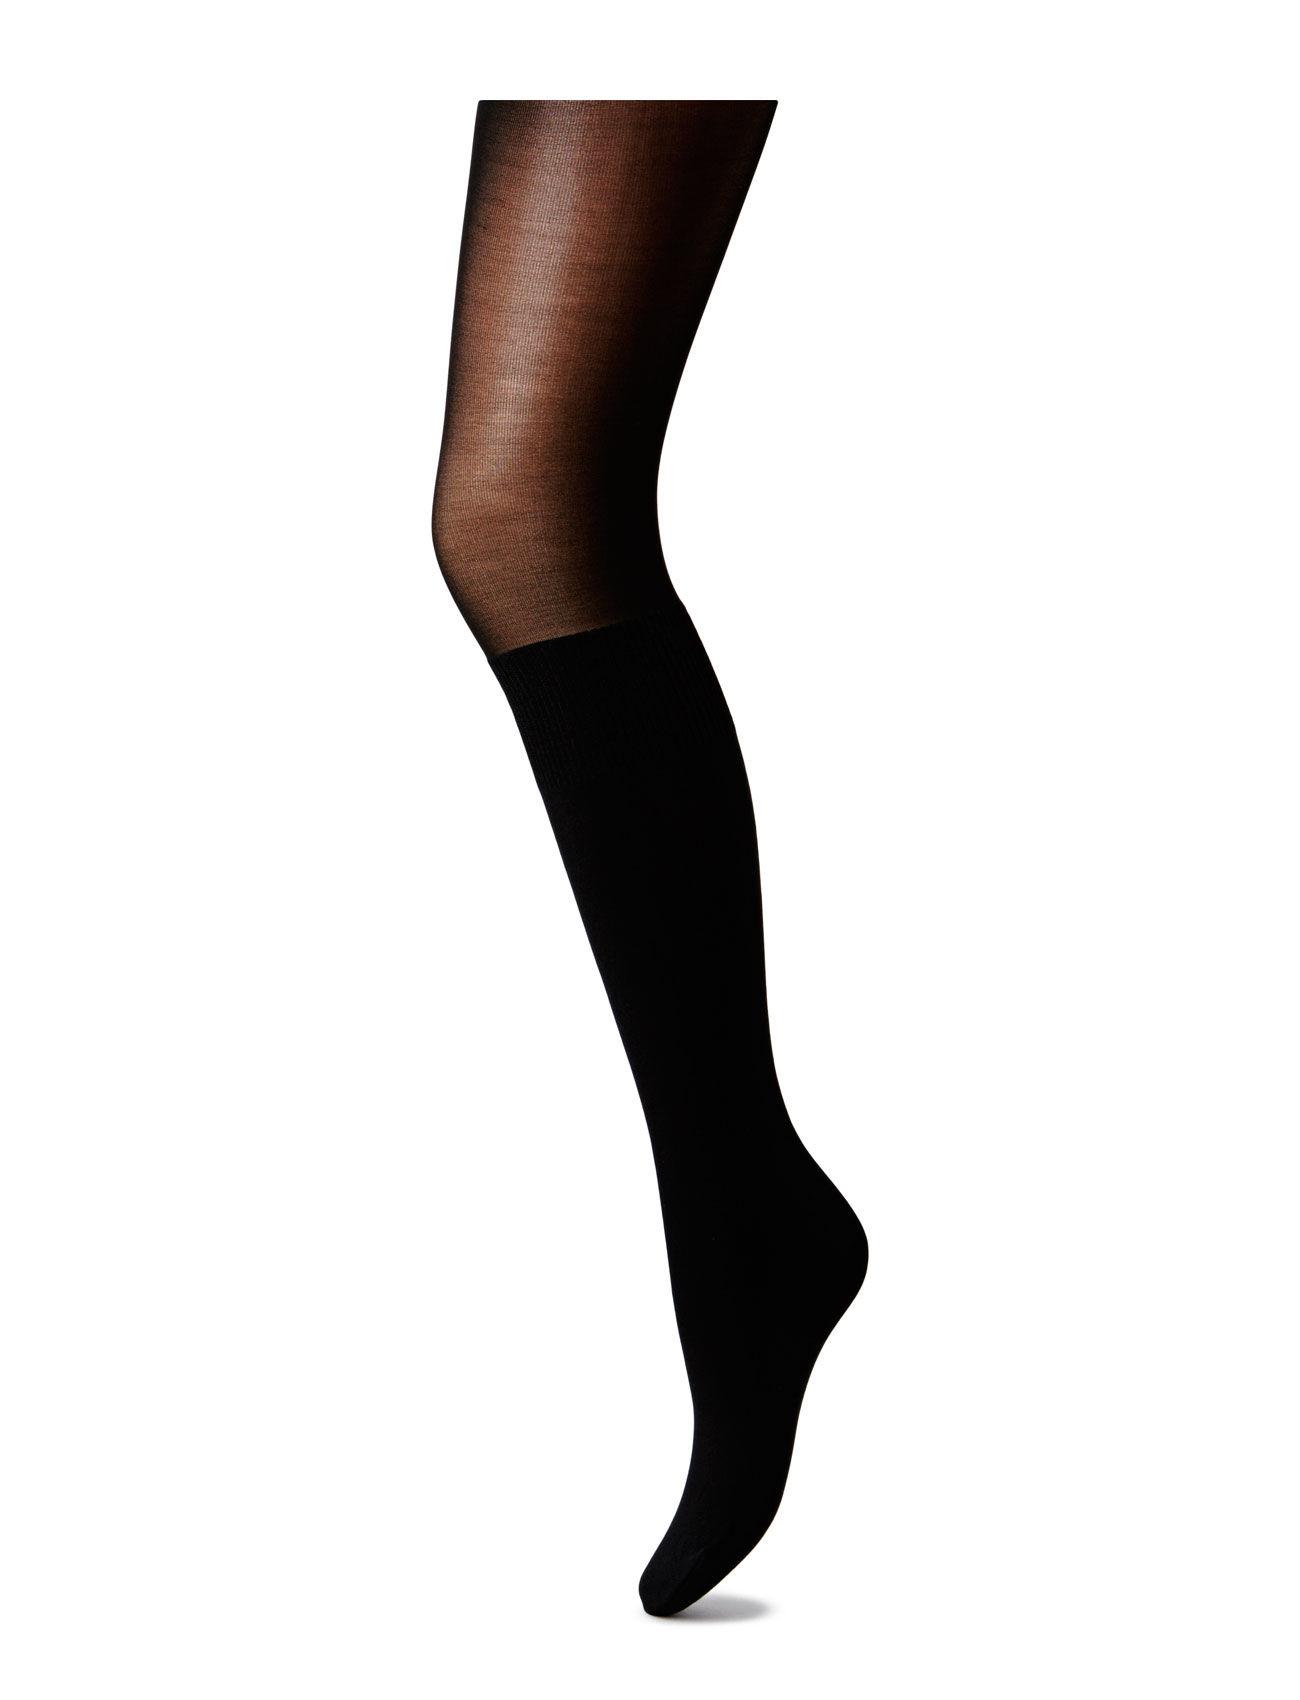 Pp Otk Modal Sock Tights Pretty Polly Strømpebukser til Damer i Sort